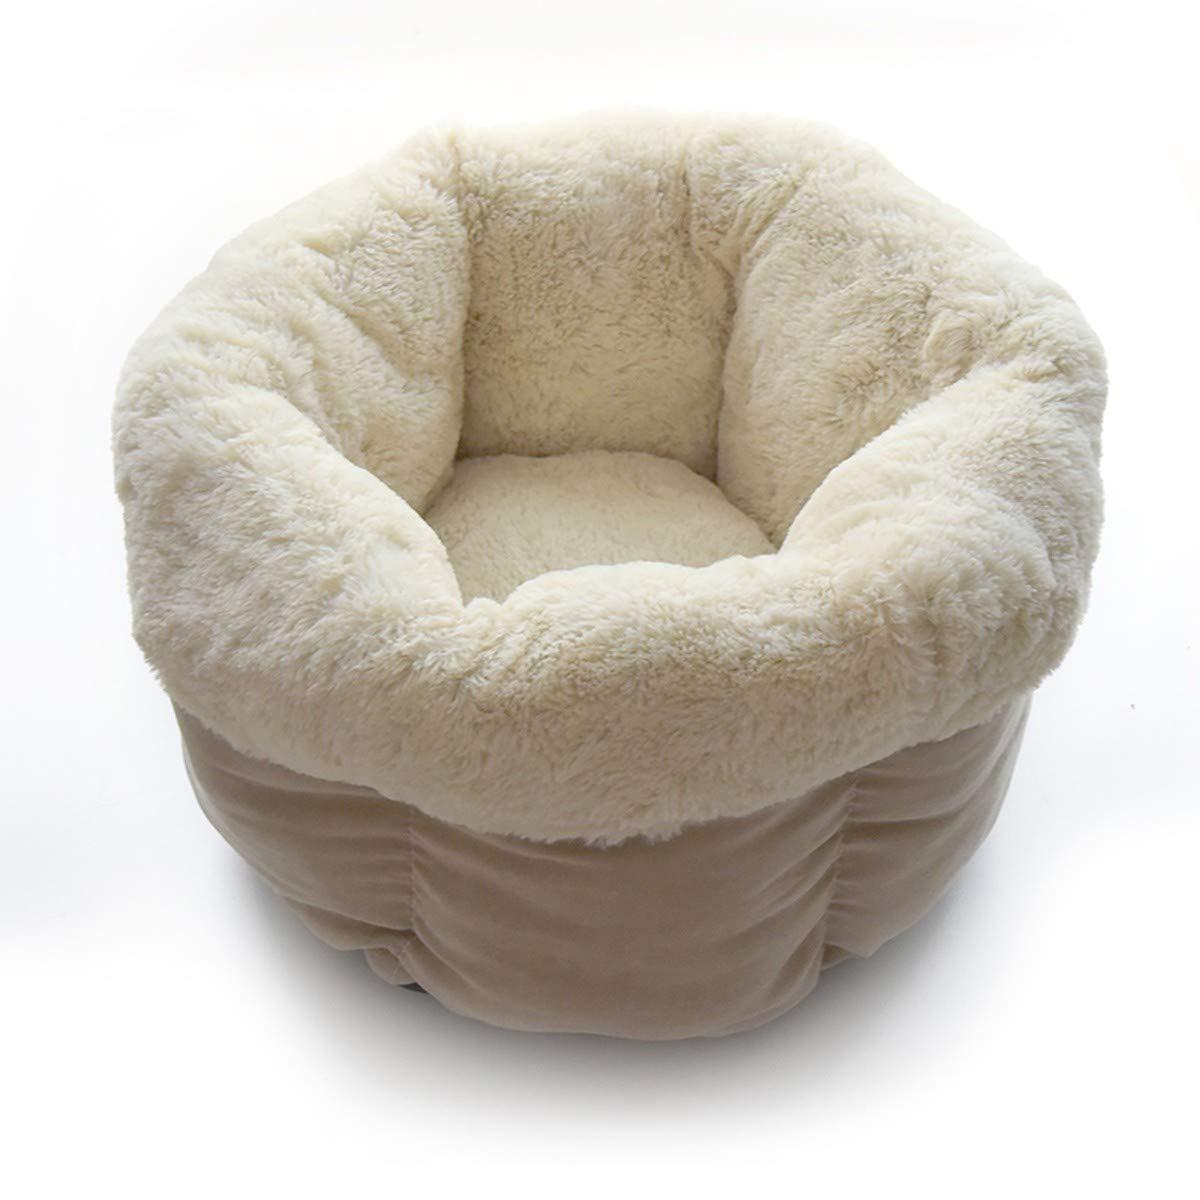 LBTSQ-Four Seasons Caliente Cerrado Cat'S Nest Sleeping Cat Sleeping Bag Casa Tienda Perro De Nido Pet Supplies Pet Nido General Purpose Un